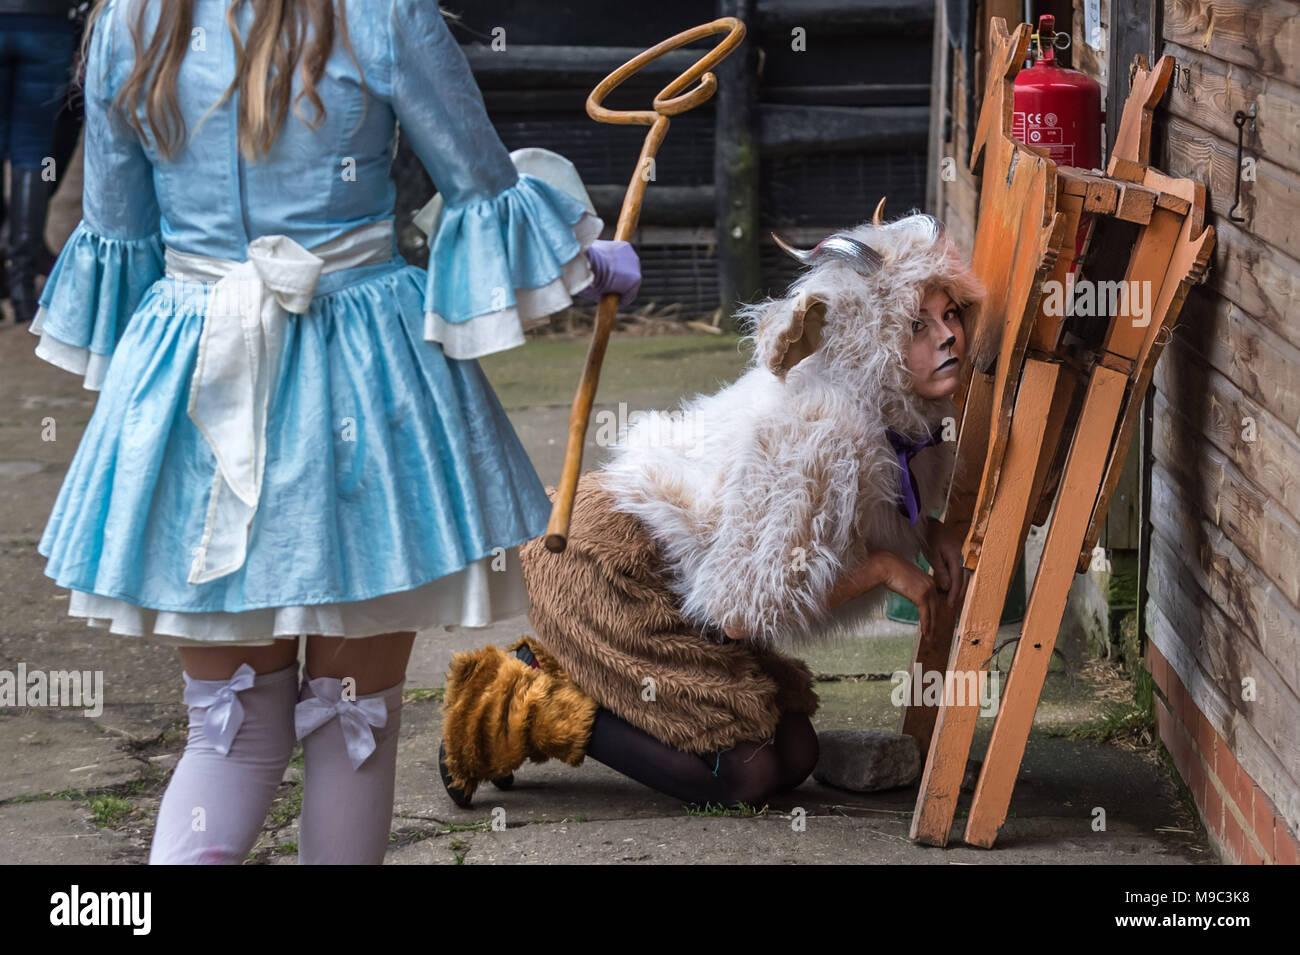 London, UK. 24th March, 2018. 10th Annual Oxford vs Cambridge Goat Race at Spitalfields City Farm. Credit: Guy Corbishley/Alamy Live News - Stock Image